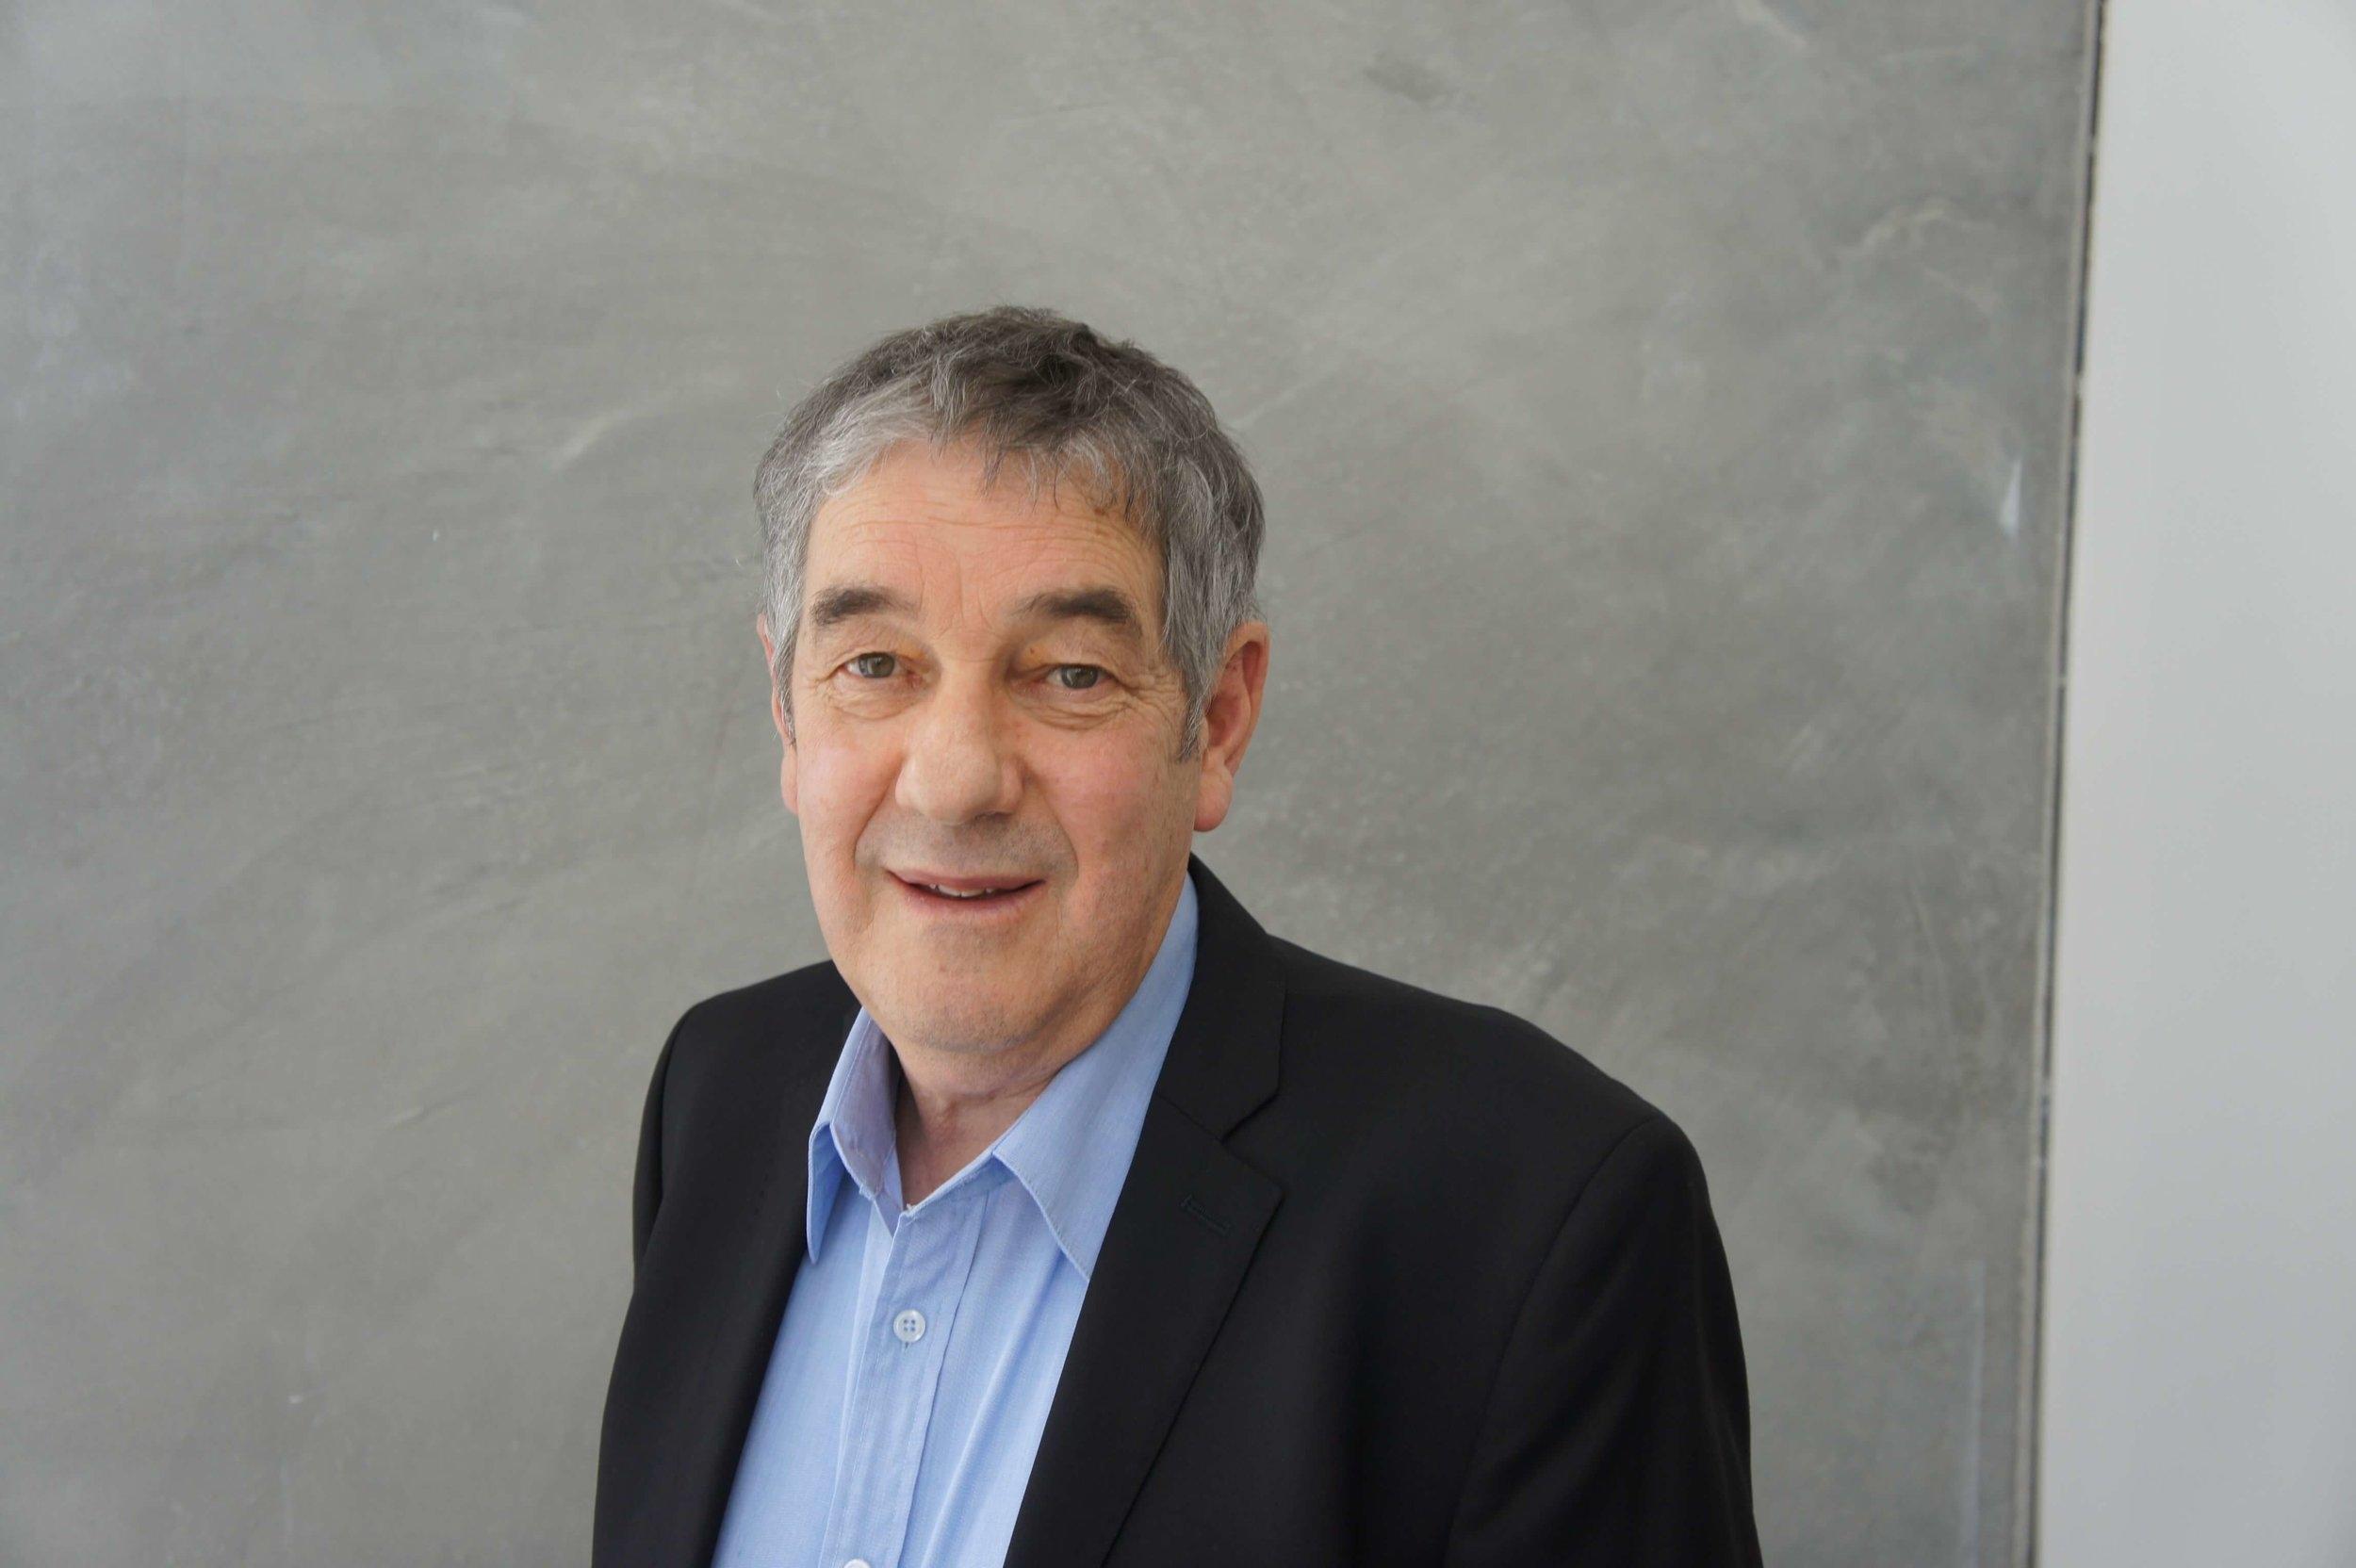 David Porter